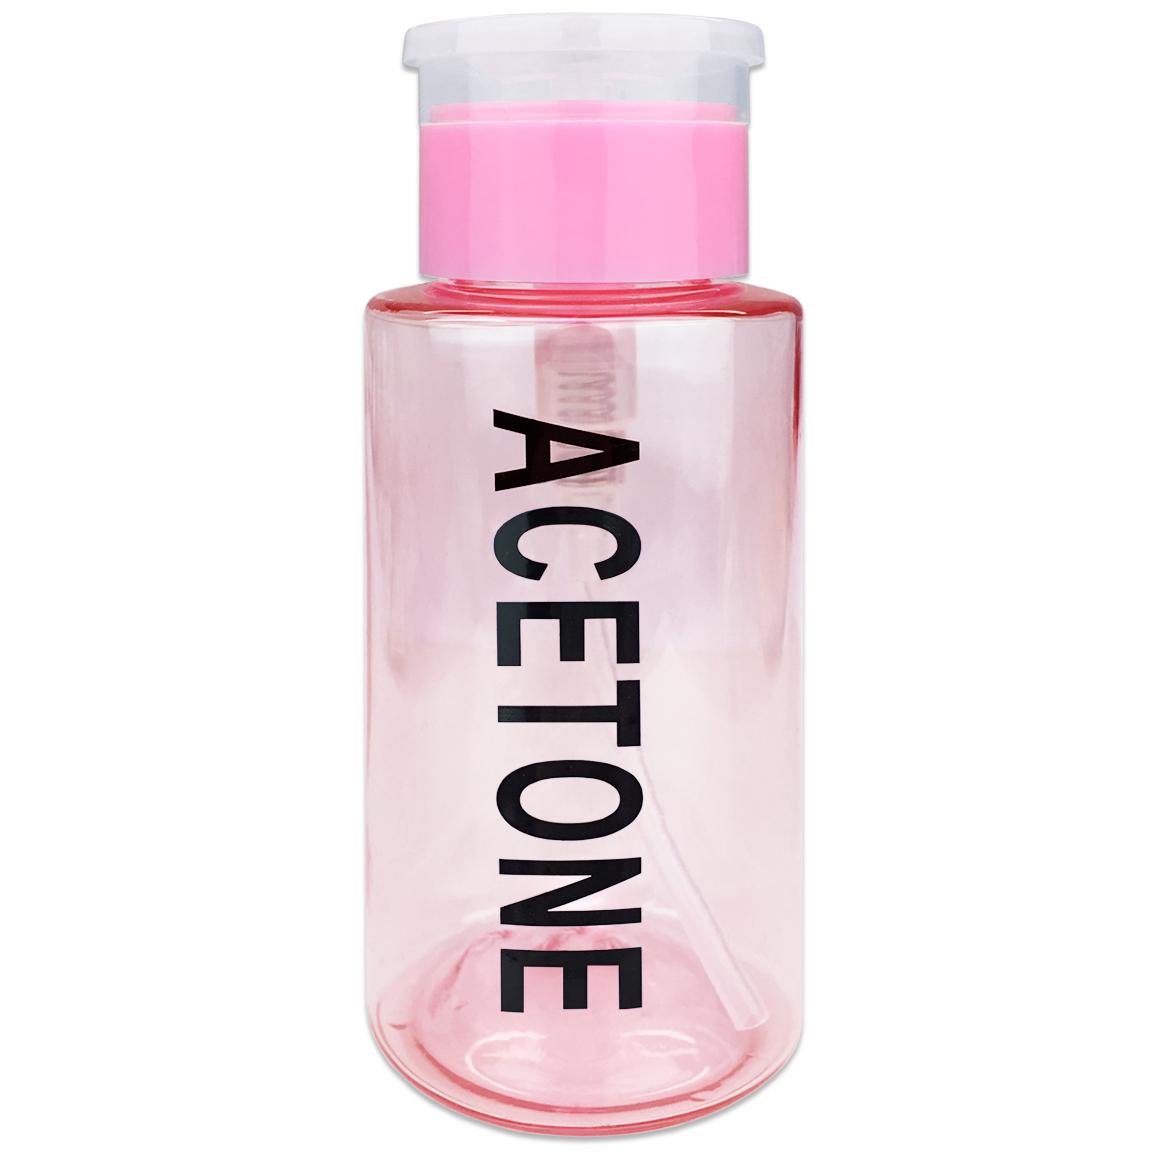 Pana High Quality 7oz Liquid Pump Dispenser With Acetone Label - Teal